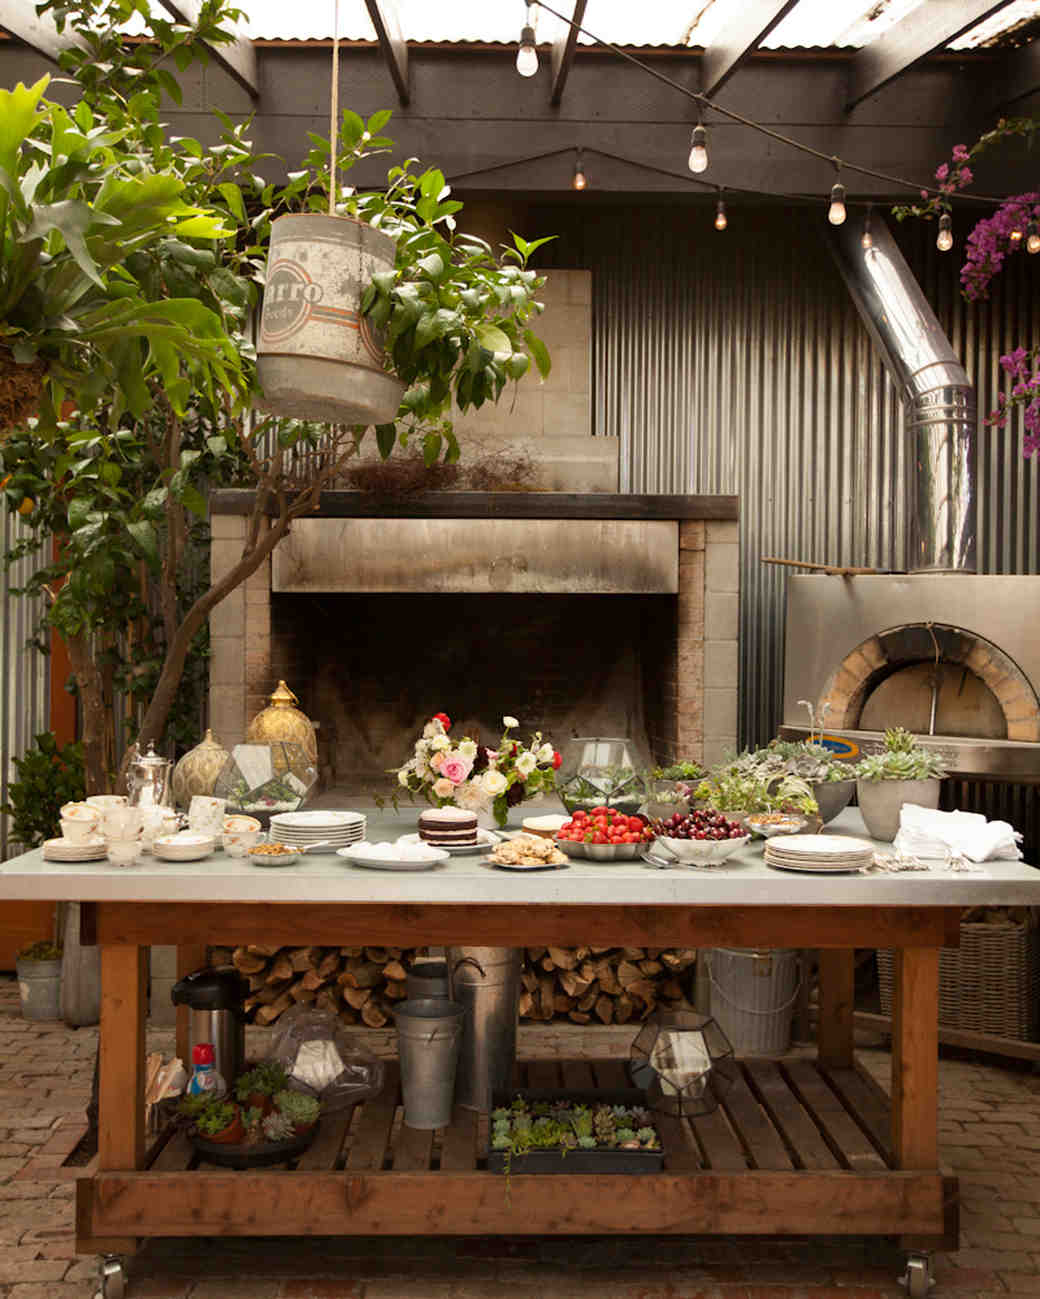 alicia-lund-nikki-bridal-shower-food-table-0715.jpg